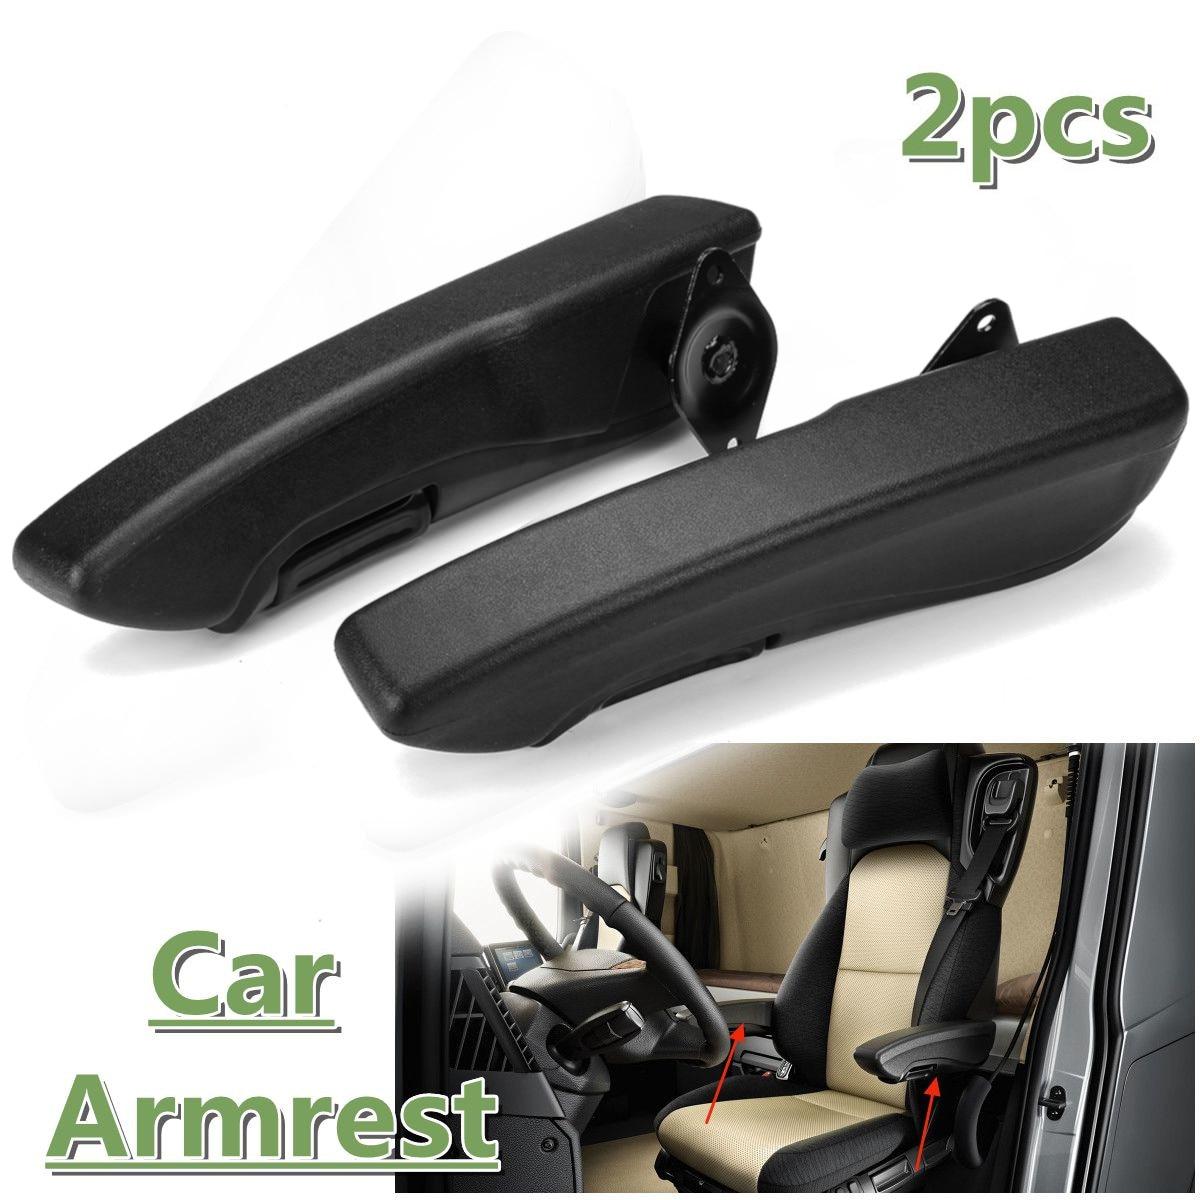 2pcs Universal Car Adjustable Armrests Arm Seat Handle Engineering Seat Hand Rail Pair Comfortable Rest PU